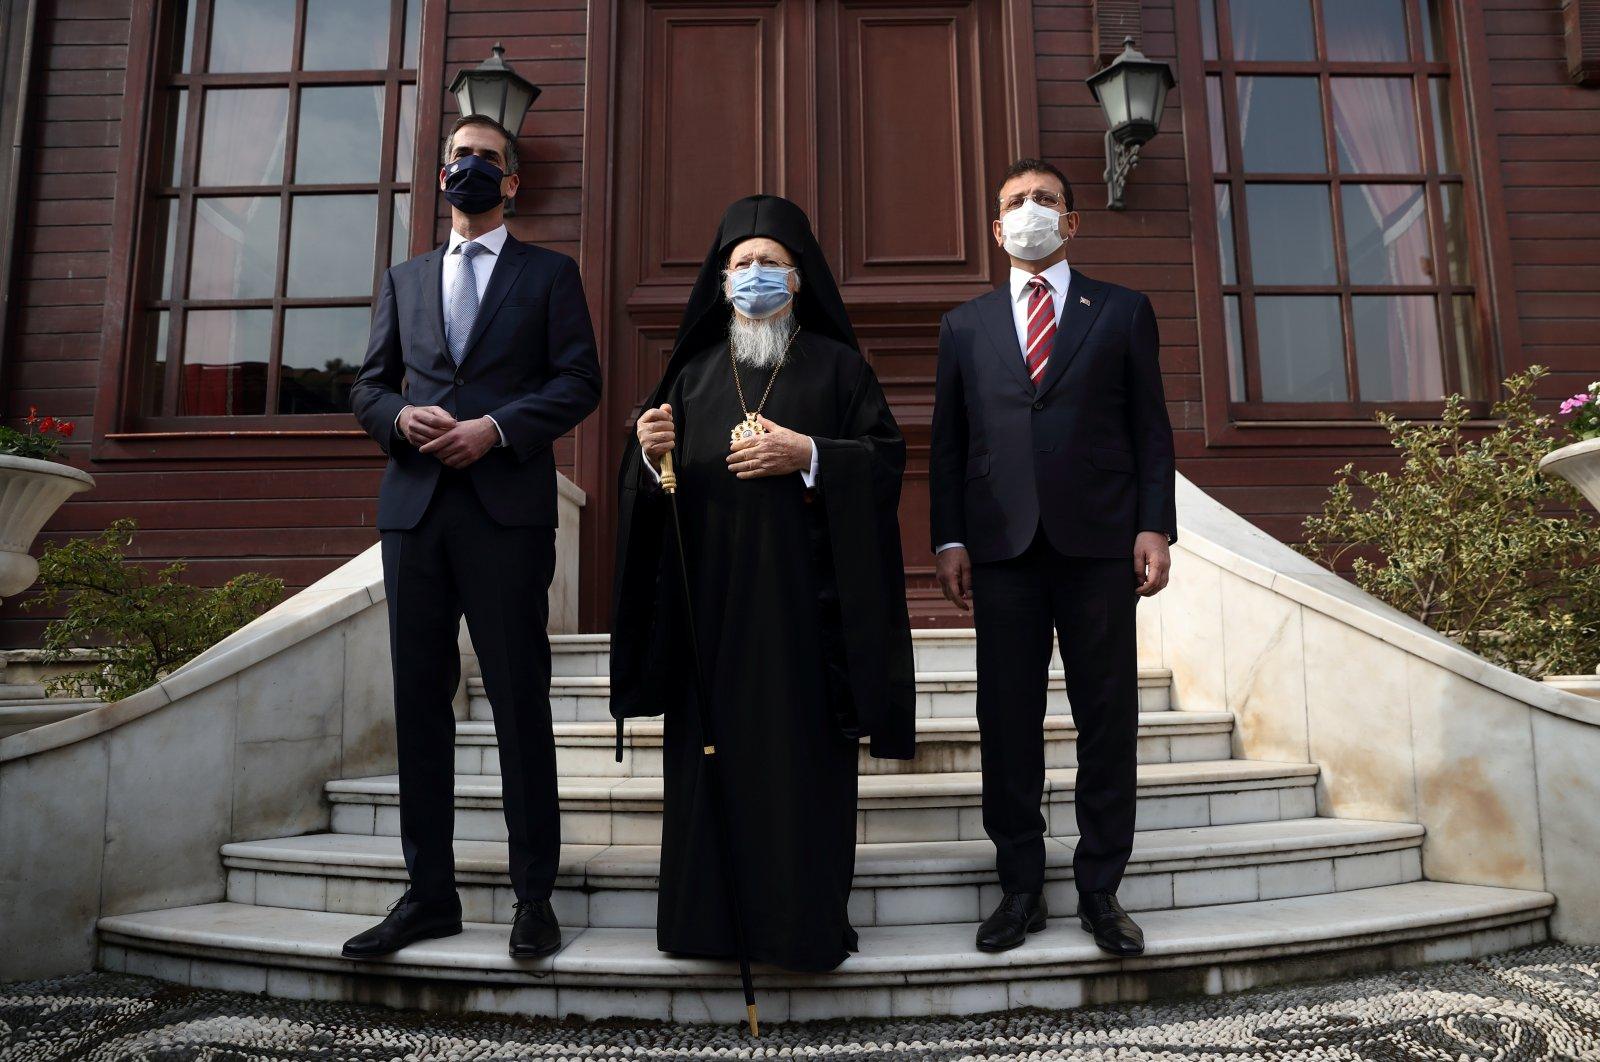 Athens Mayor Kostas Bakoyannis (L), Patriarch Bartholomew I (C) and Istanbul Metropolitan Mayor Ekrem Imamoğlu pose together as they visit the Greek Orthodox Patriarchate in Istanbul, Turkey, March 19, 2021. (Reuters Photo)